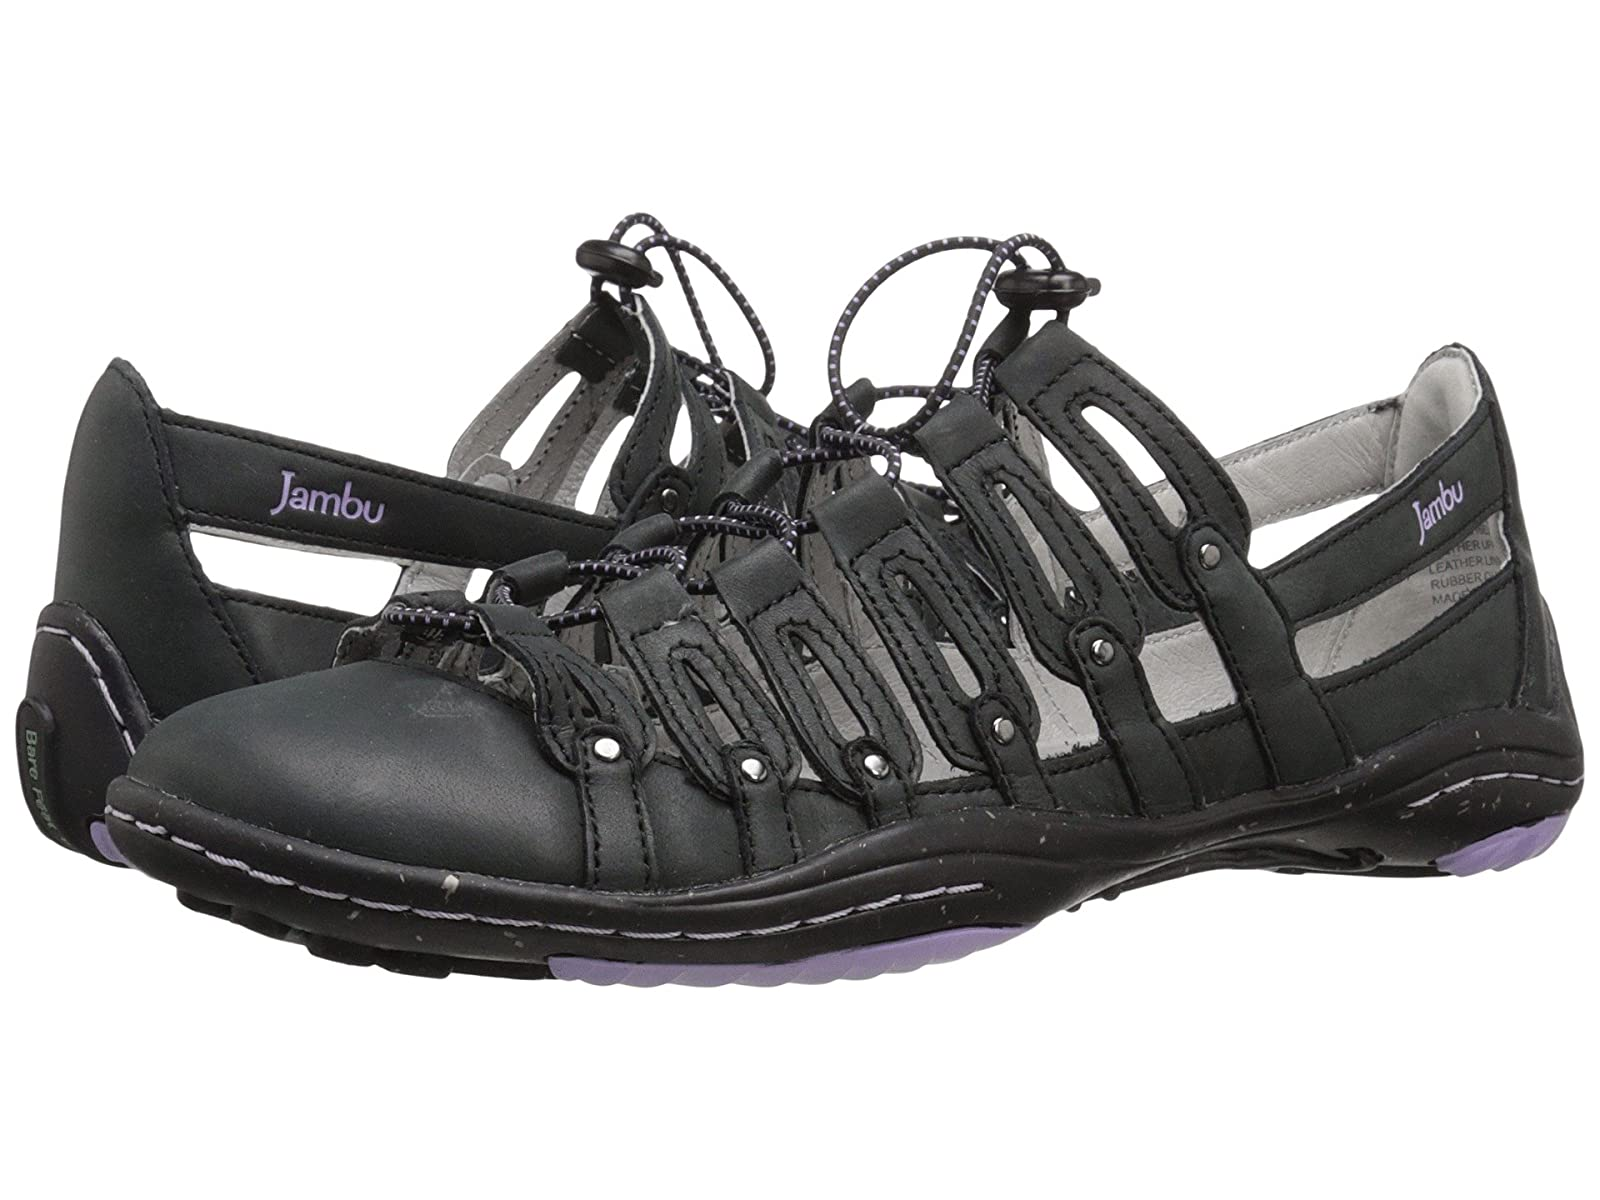 Jambu El DoradoCheap and distinctive eye-catching shoes